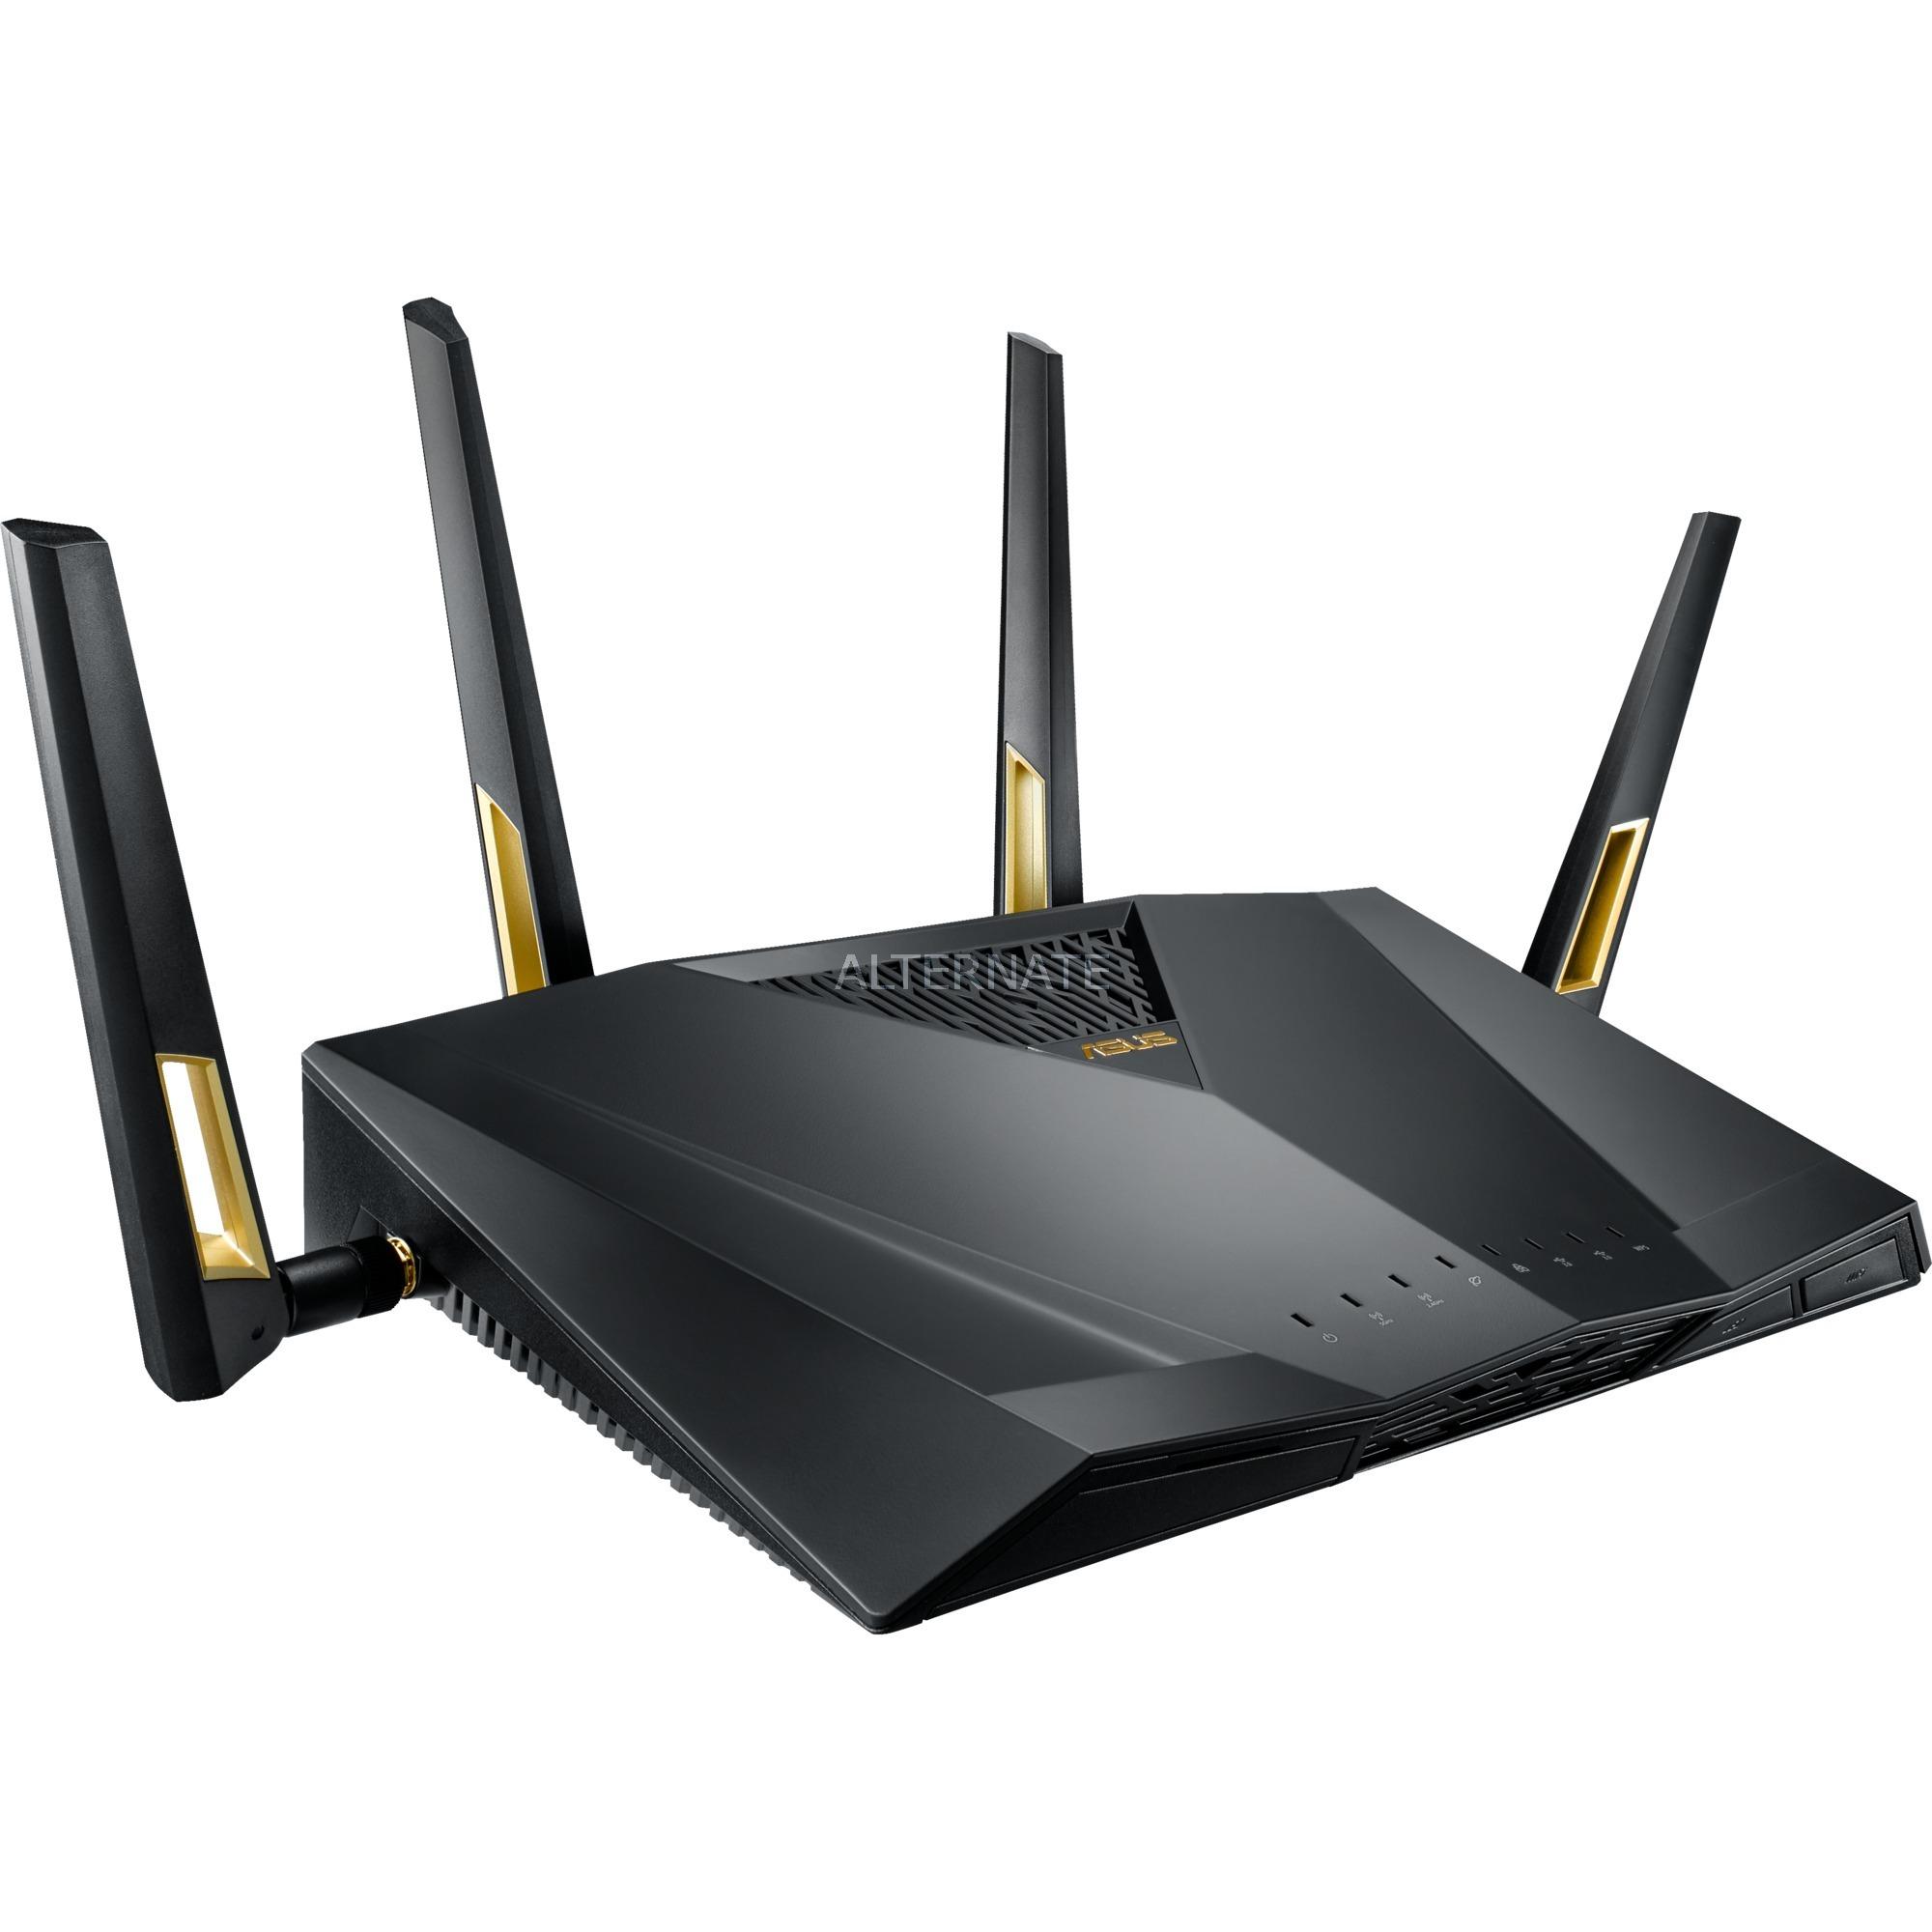 AX6000 Dual Band Wi-Fi 6 (802.11ax) Router